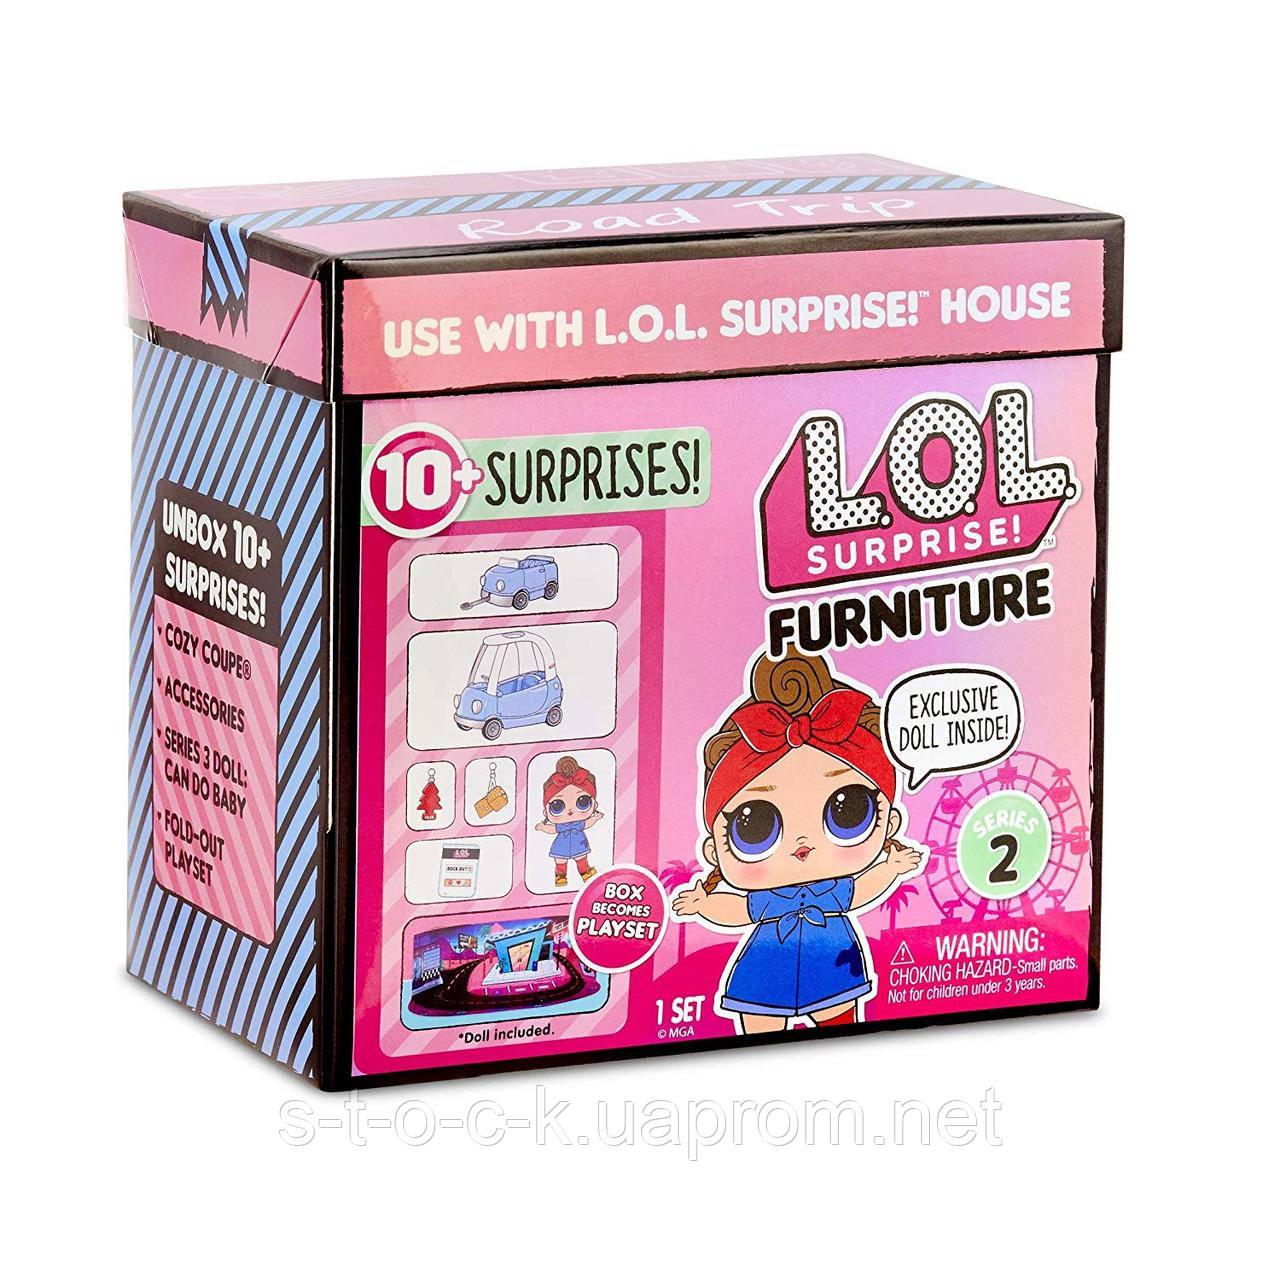 L.O.L. Surprise! 564928E7C Мебель для домика и кемпера кукол L.O.L. Surprise! Furniture Series 2.